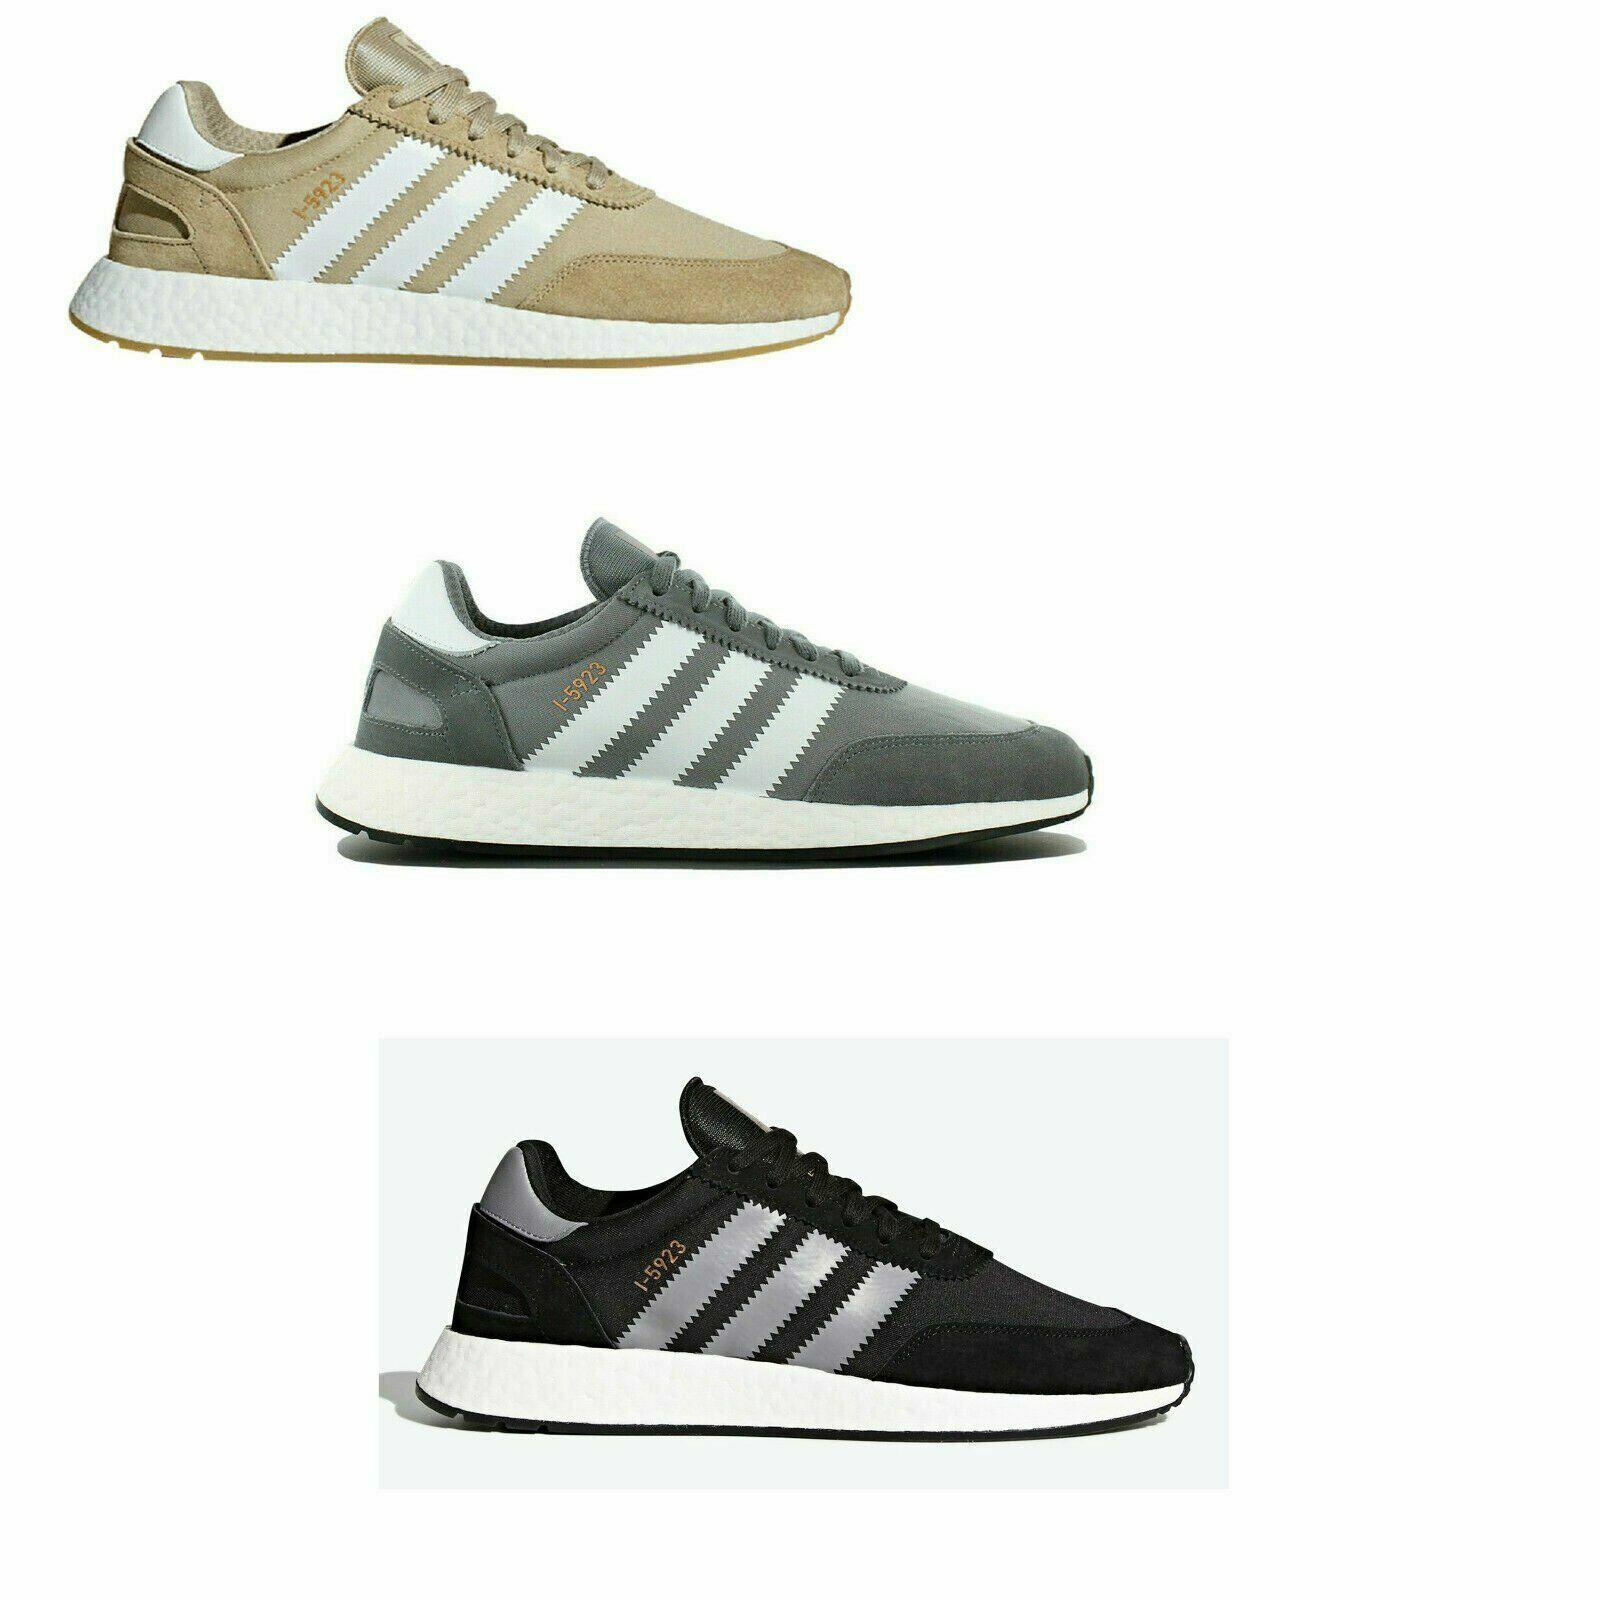 Original Adidas Iniki Runner I-5923 Trainers Turnschuhe grau Gold Beige braun